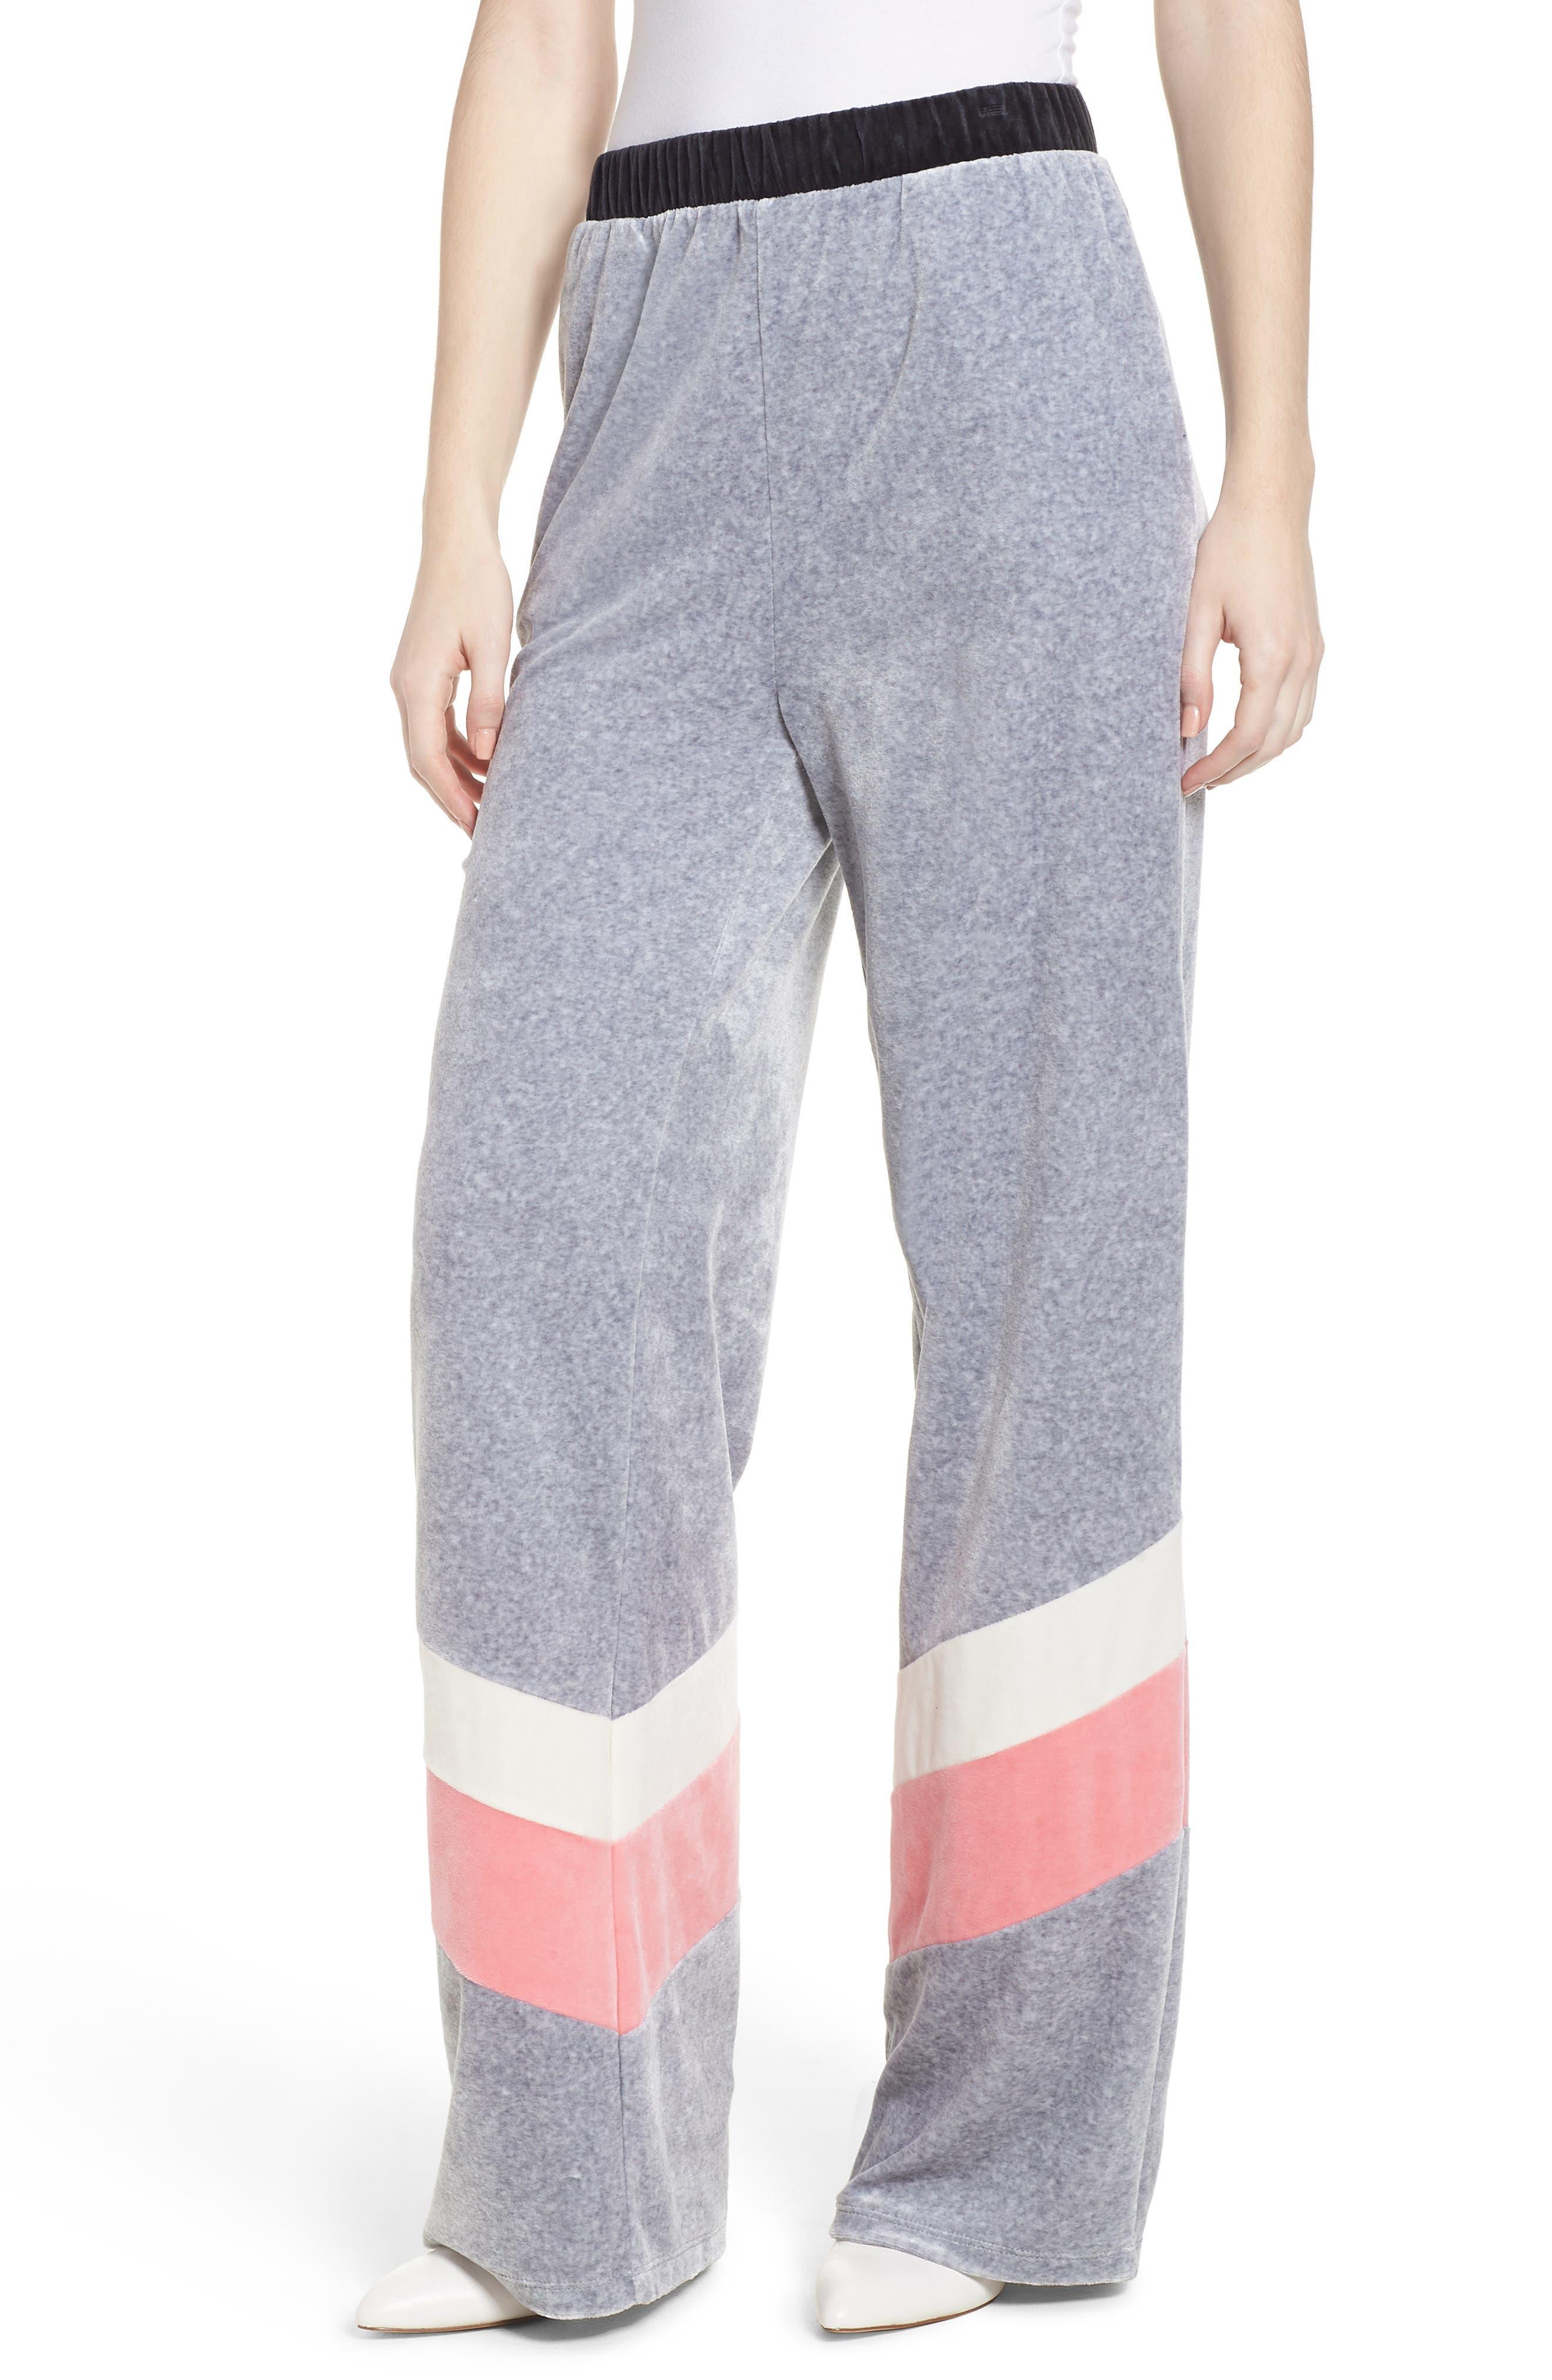 Colorblock Velour Wide Leg Pants,                             Main thumbnail 1, color,                             Silver Lining Angel Combo